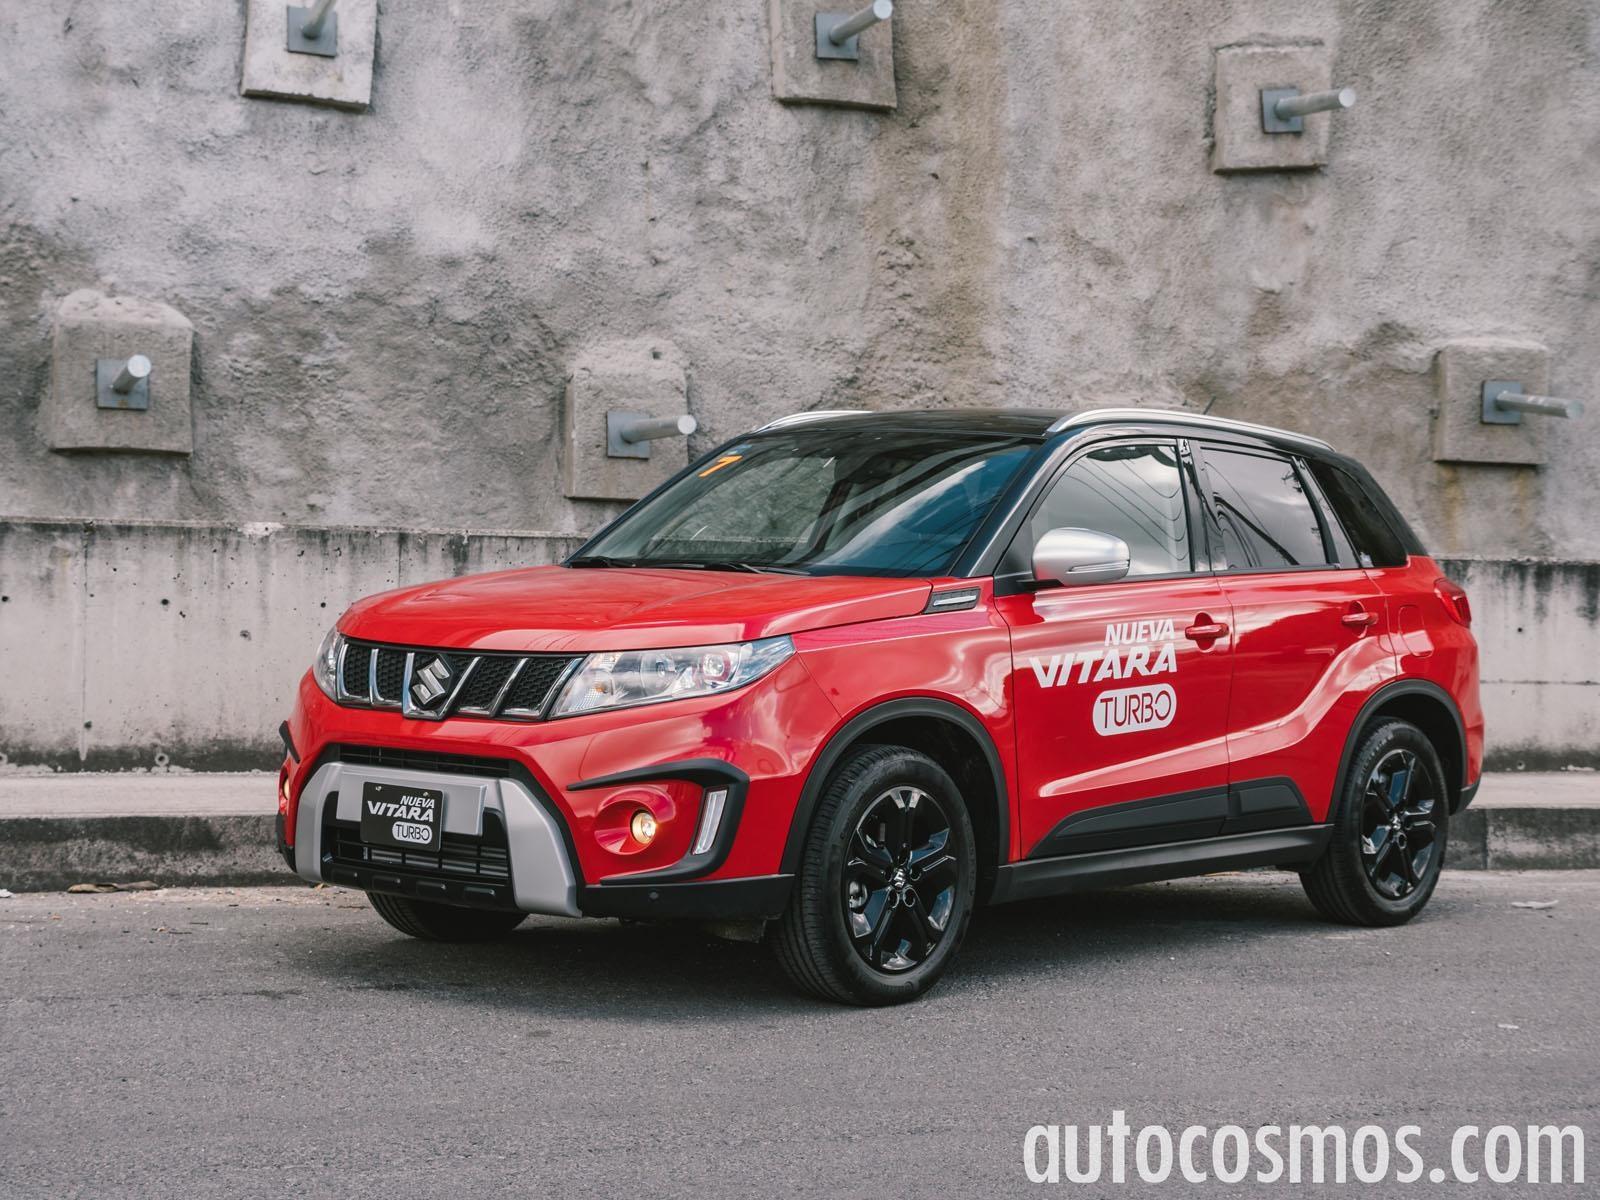 Suzuki Vitara Turbo 2017